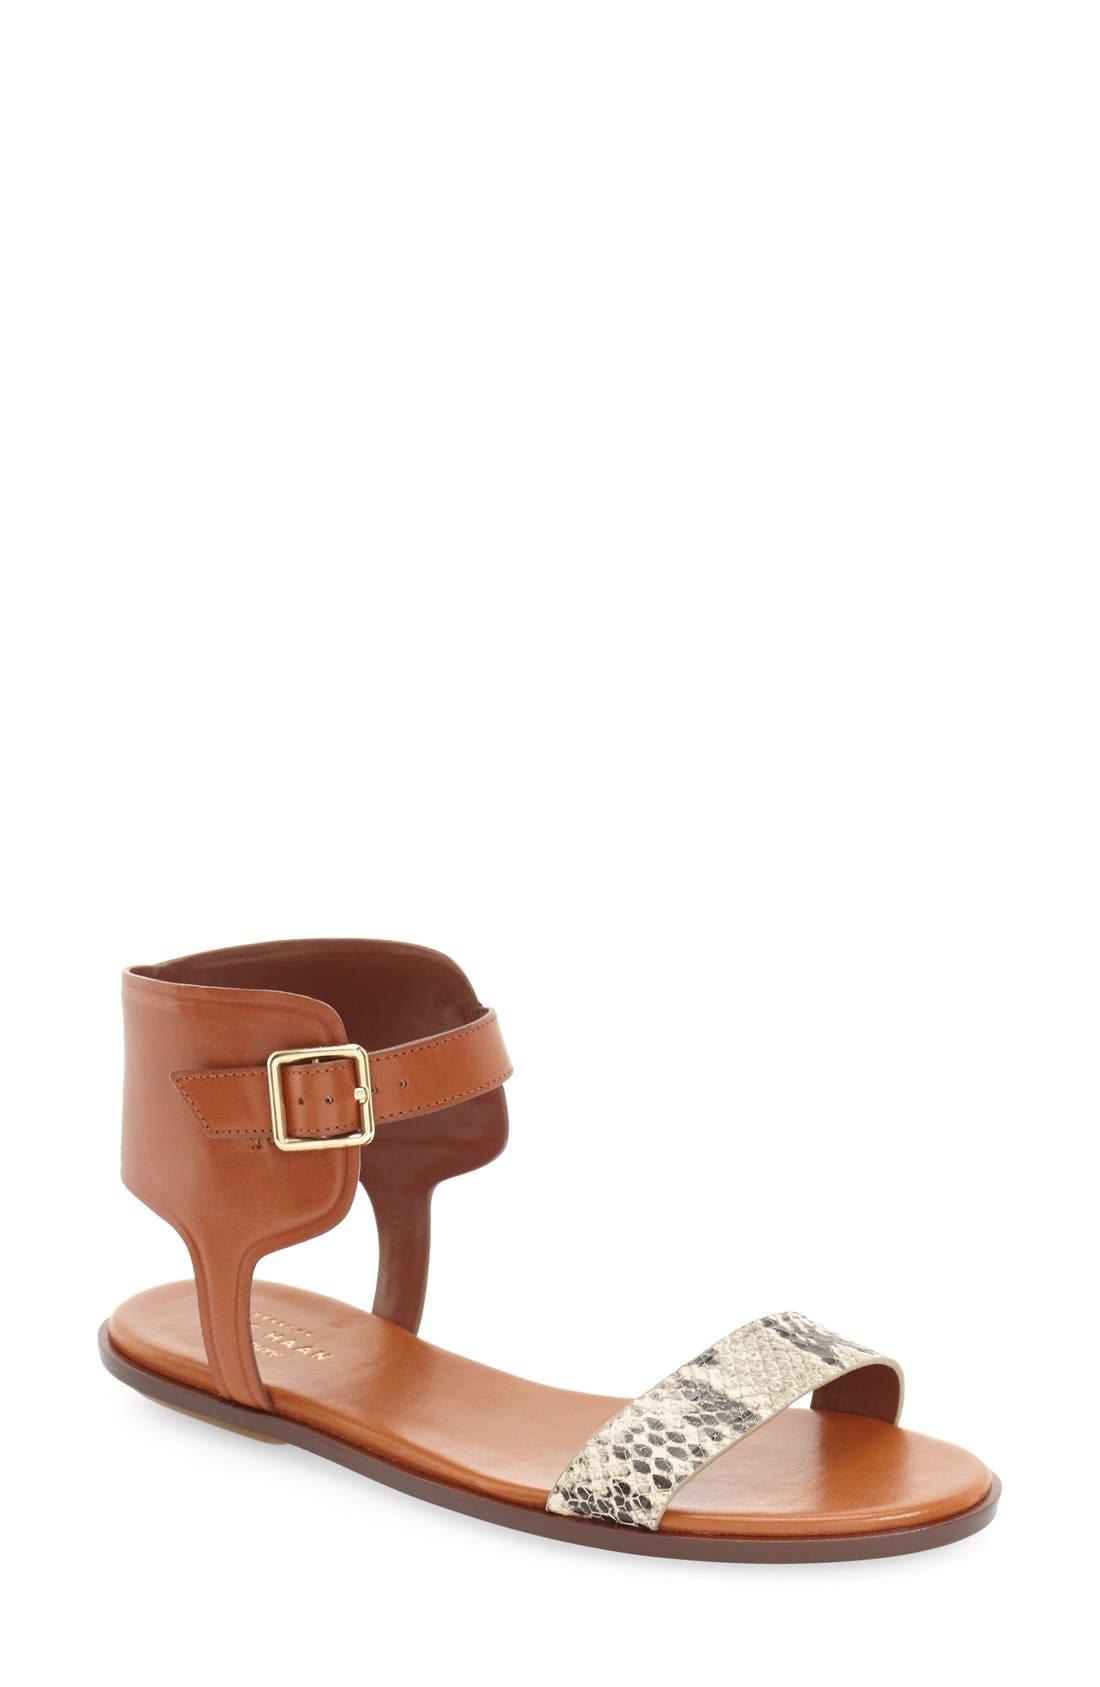 Main Image - Cole Haan 'Barra' Flat Sandal (Women)